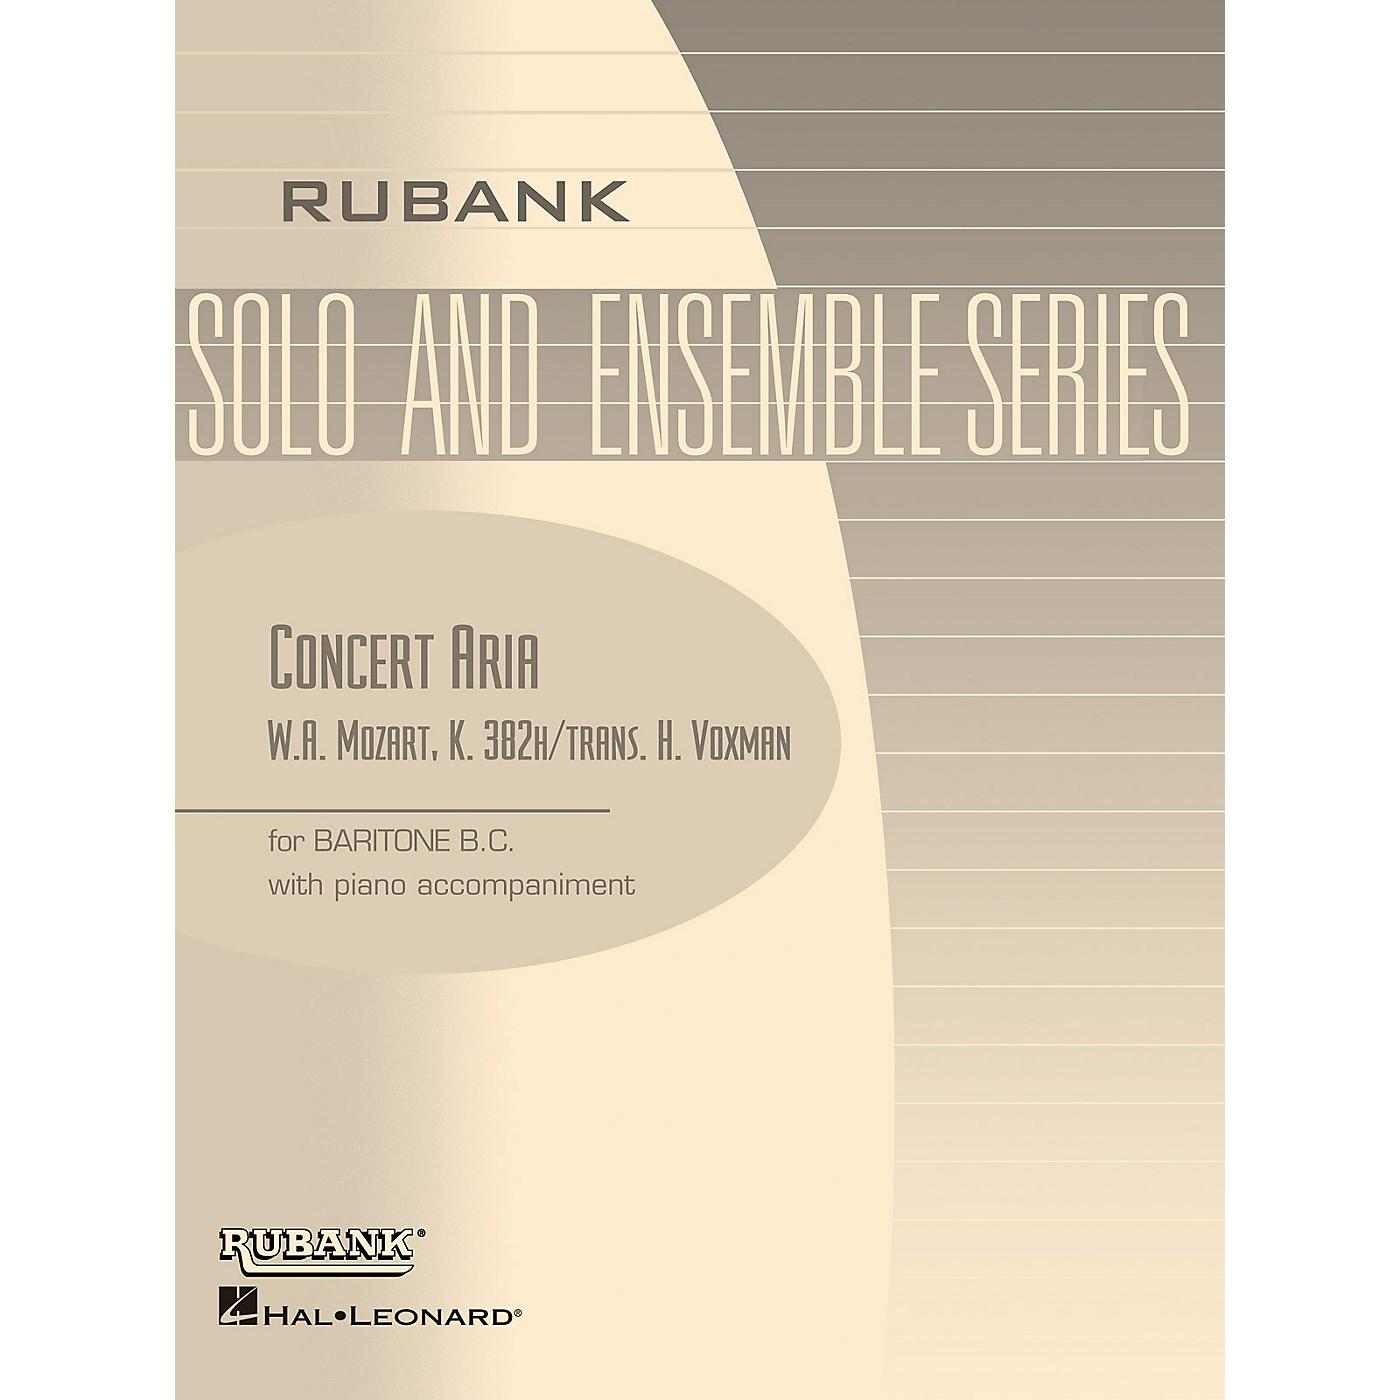 Rubank Publications Concert Aria, K. 382h (Baritone B.C. Solo with Piano - Grade 3.5) Rubank Solo/Ensemble Sheet Series thumbnail